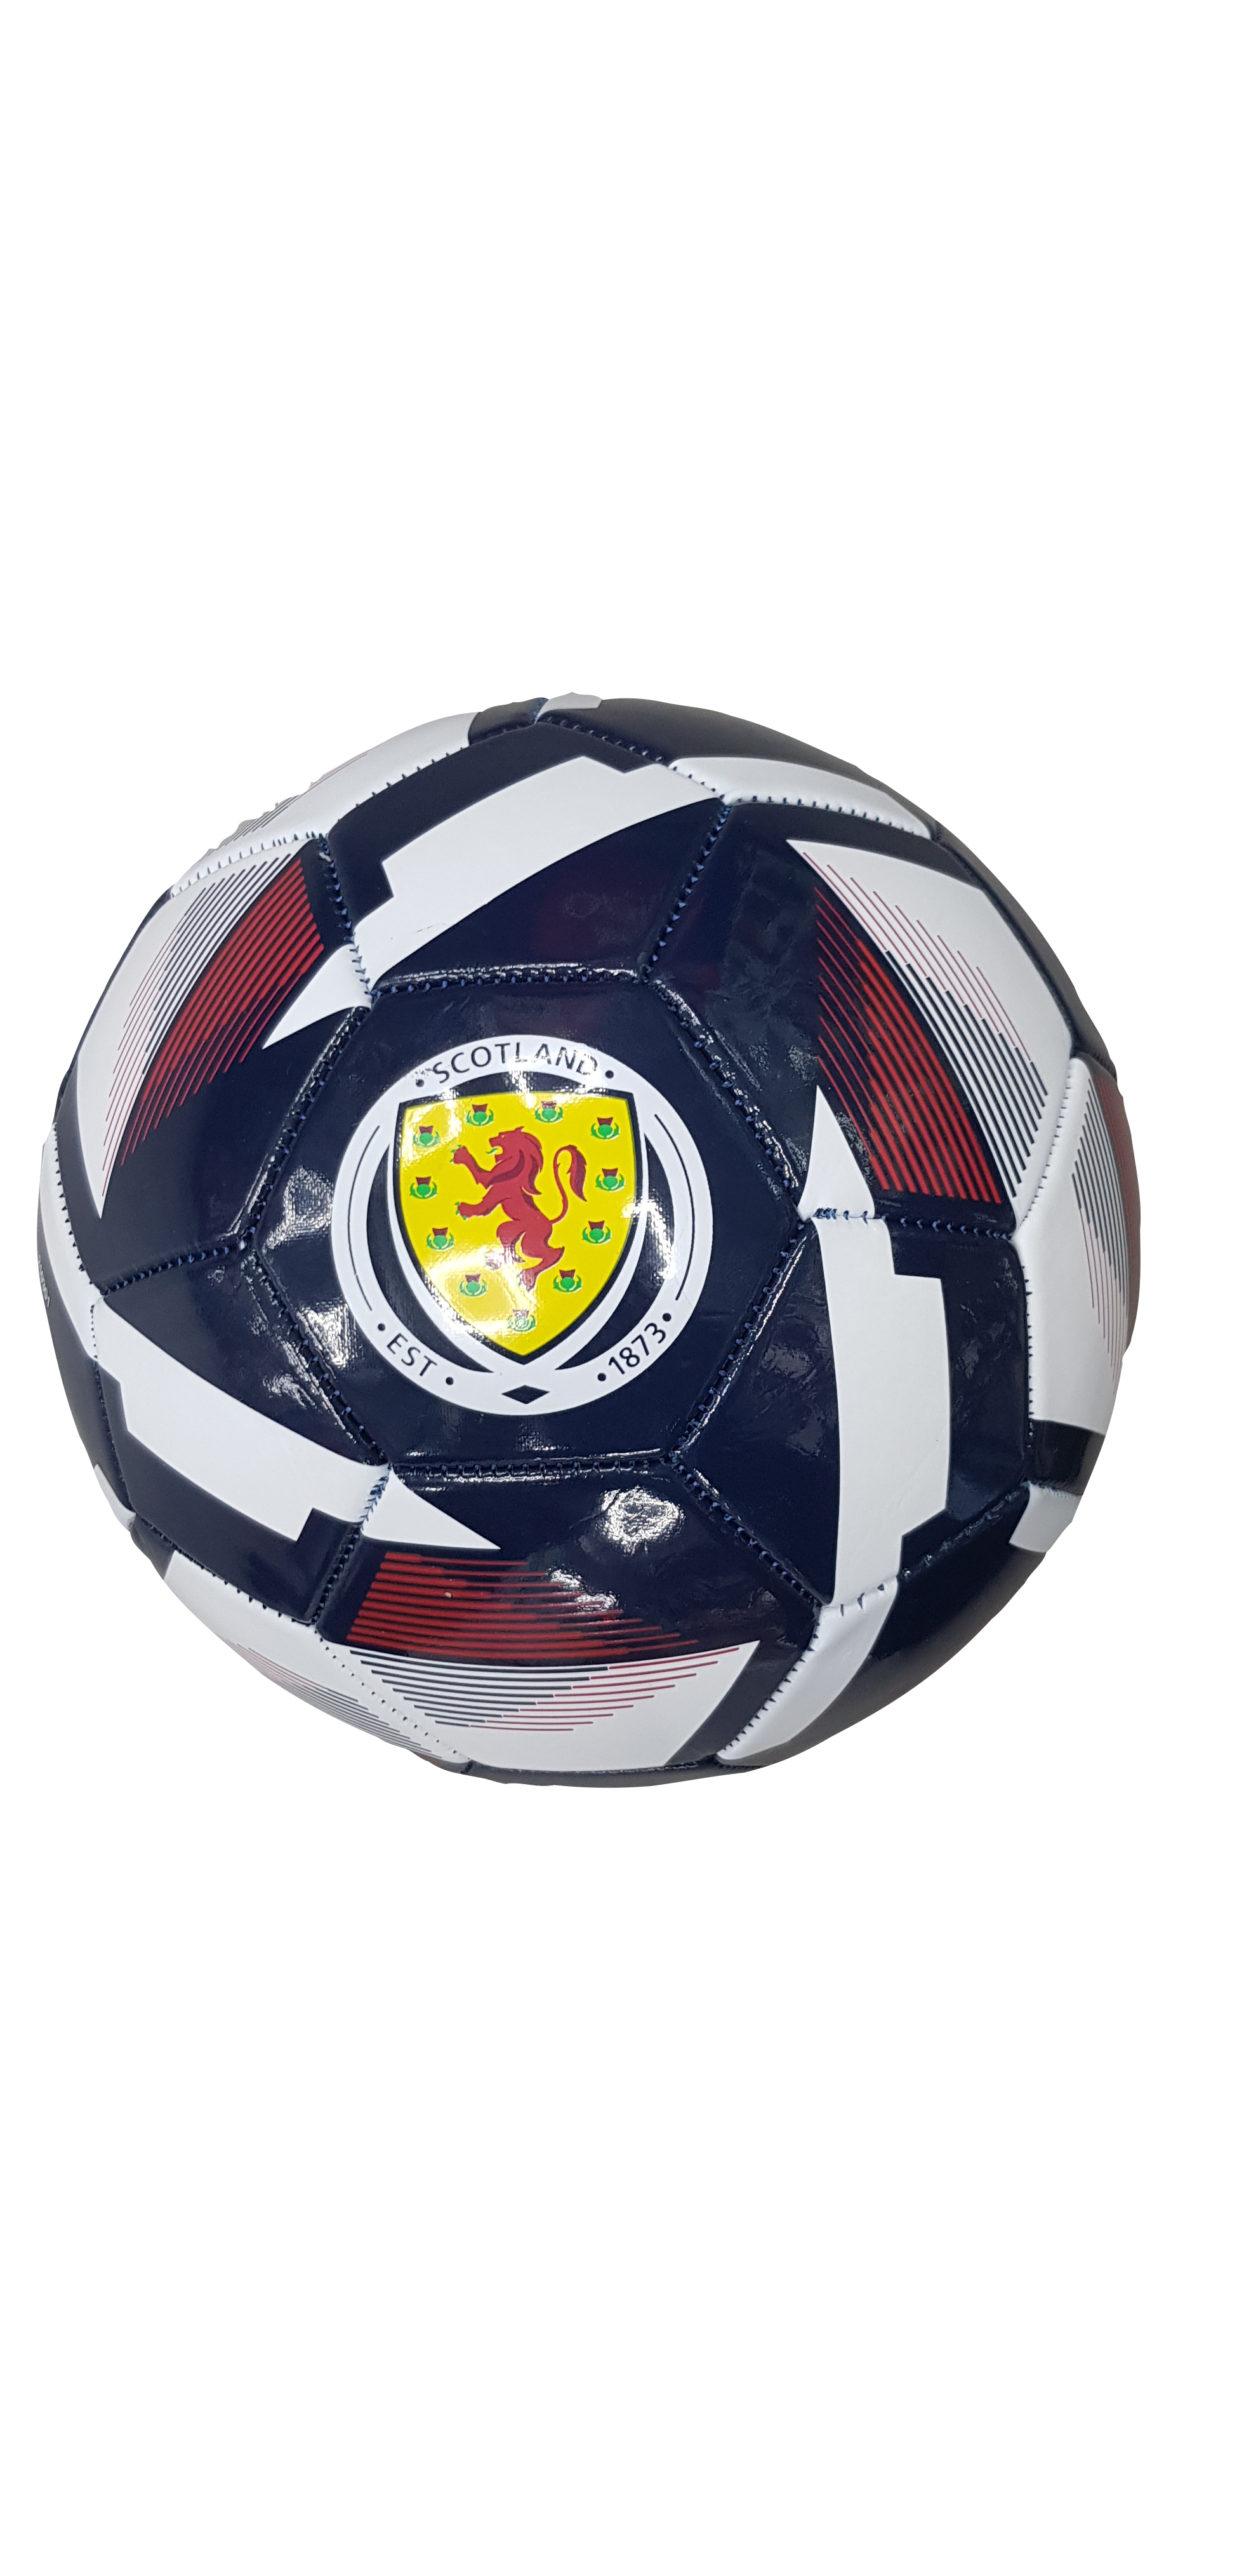 Scotland Football (Size 5)